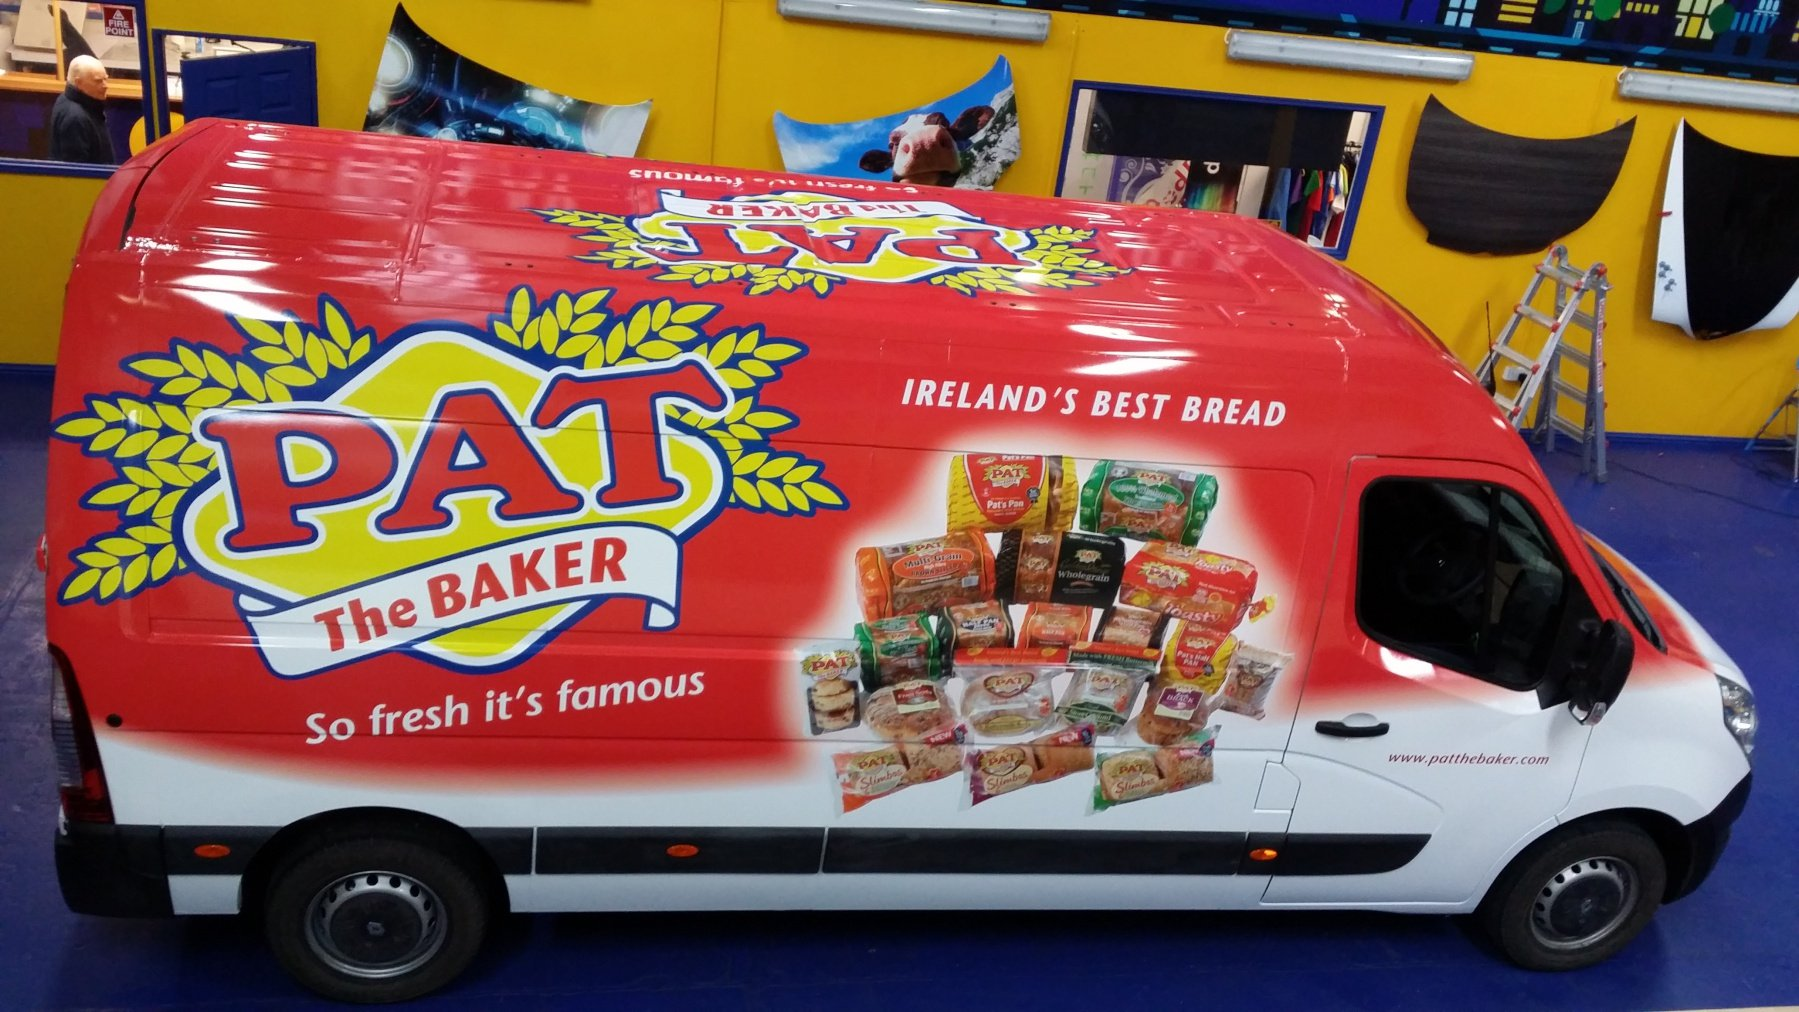 So Fresh It S Famous New Full Colour Van Wraps For Pat